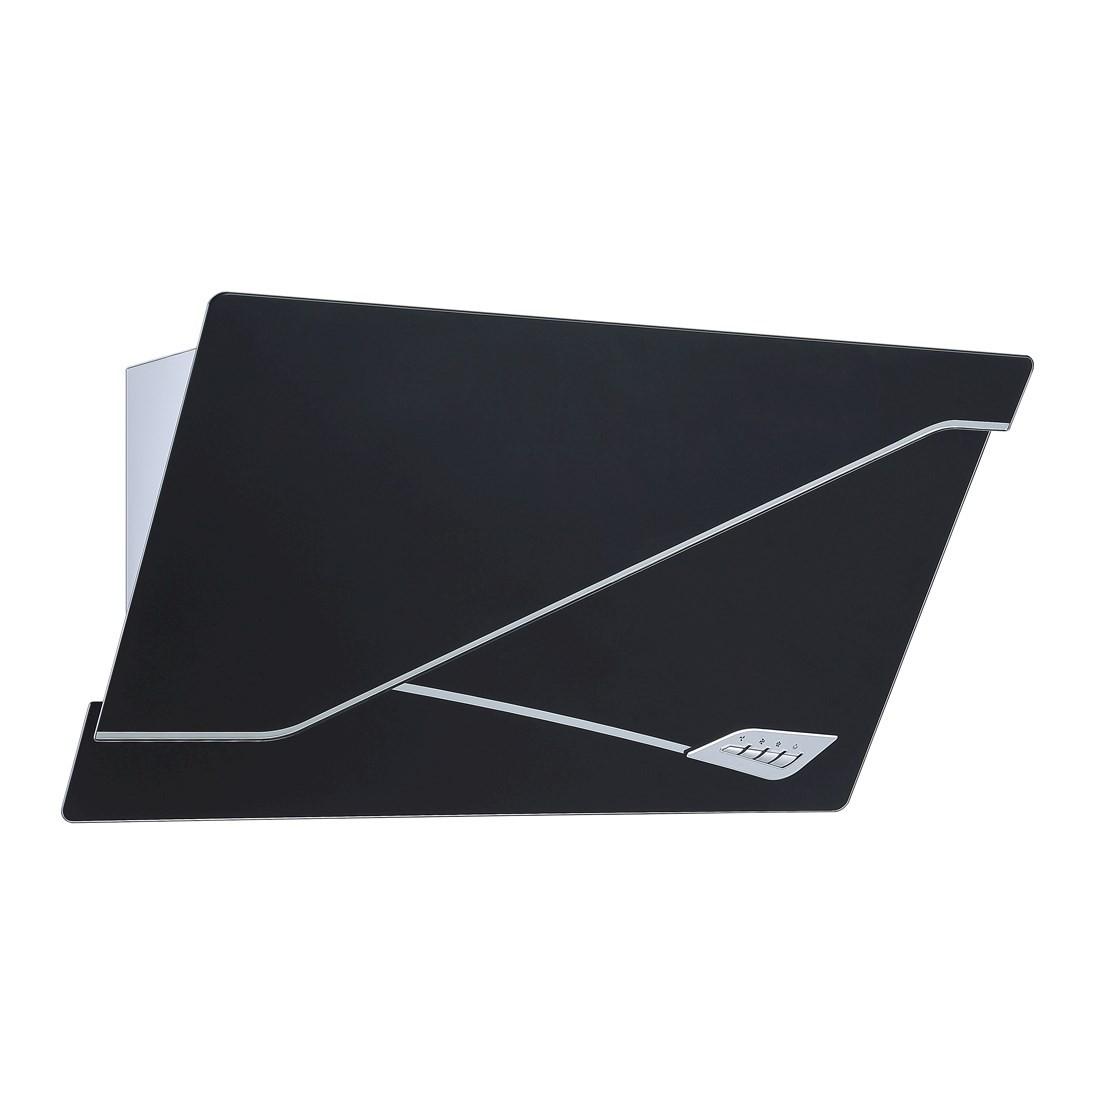 Coifa Elettromec Stile Parede Inox e Vidro 90cm 220V